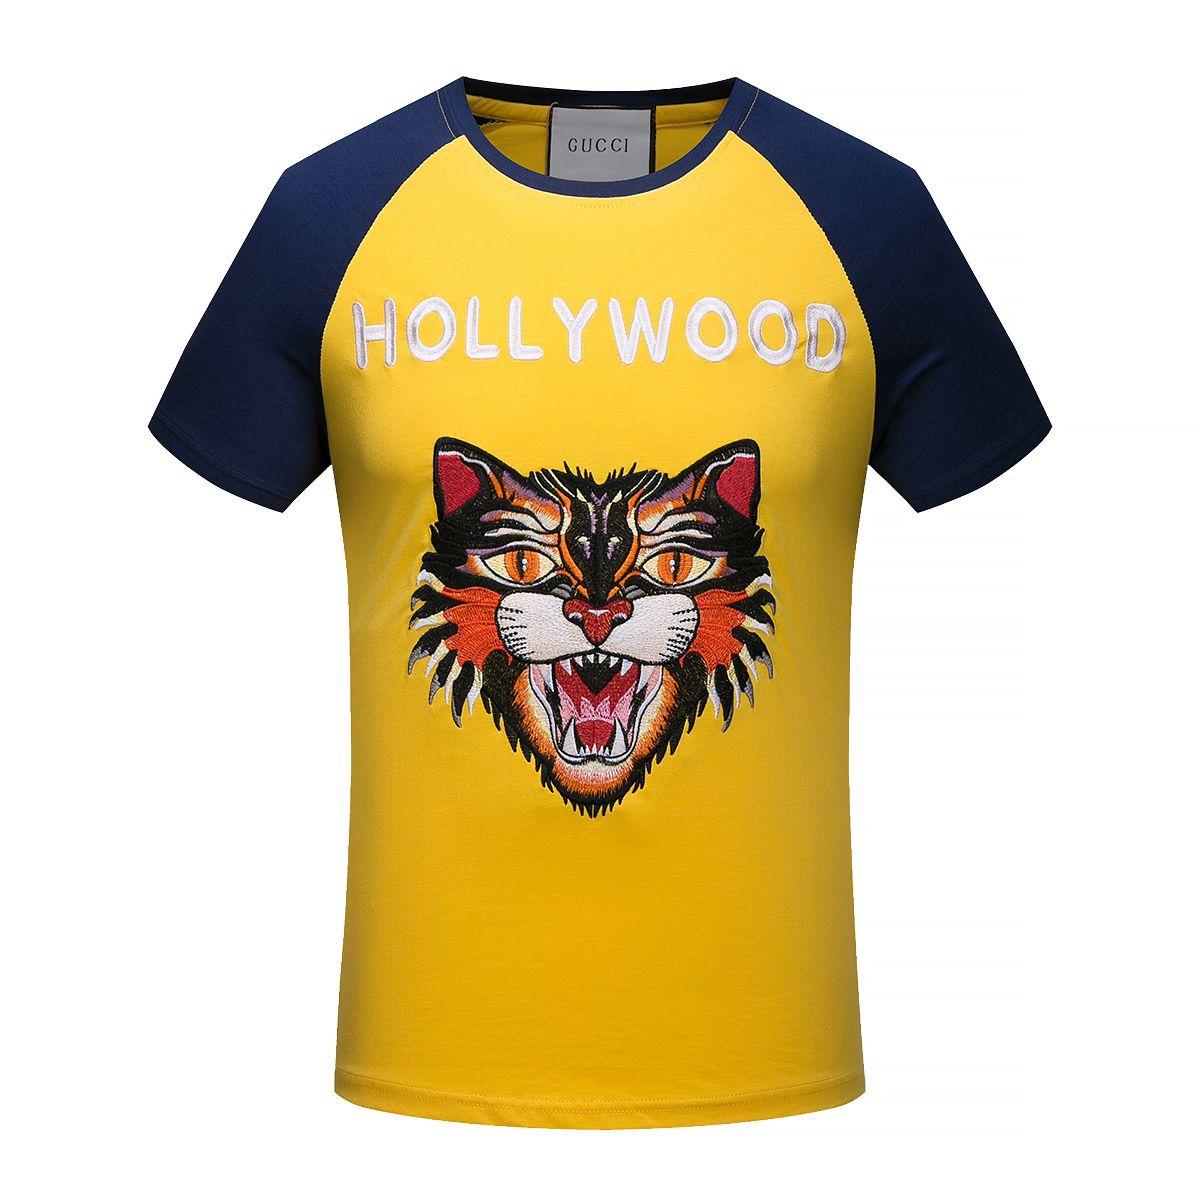 6a8bf1bca Replica GUCCI T Shirt 2018 For Men Size M-XXXL ID: ID:37837 | 2018 ...